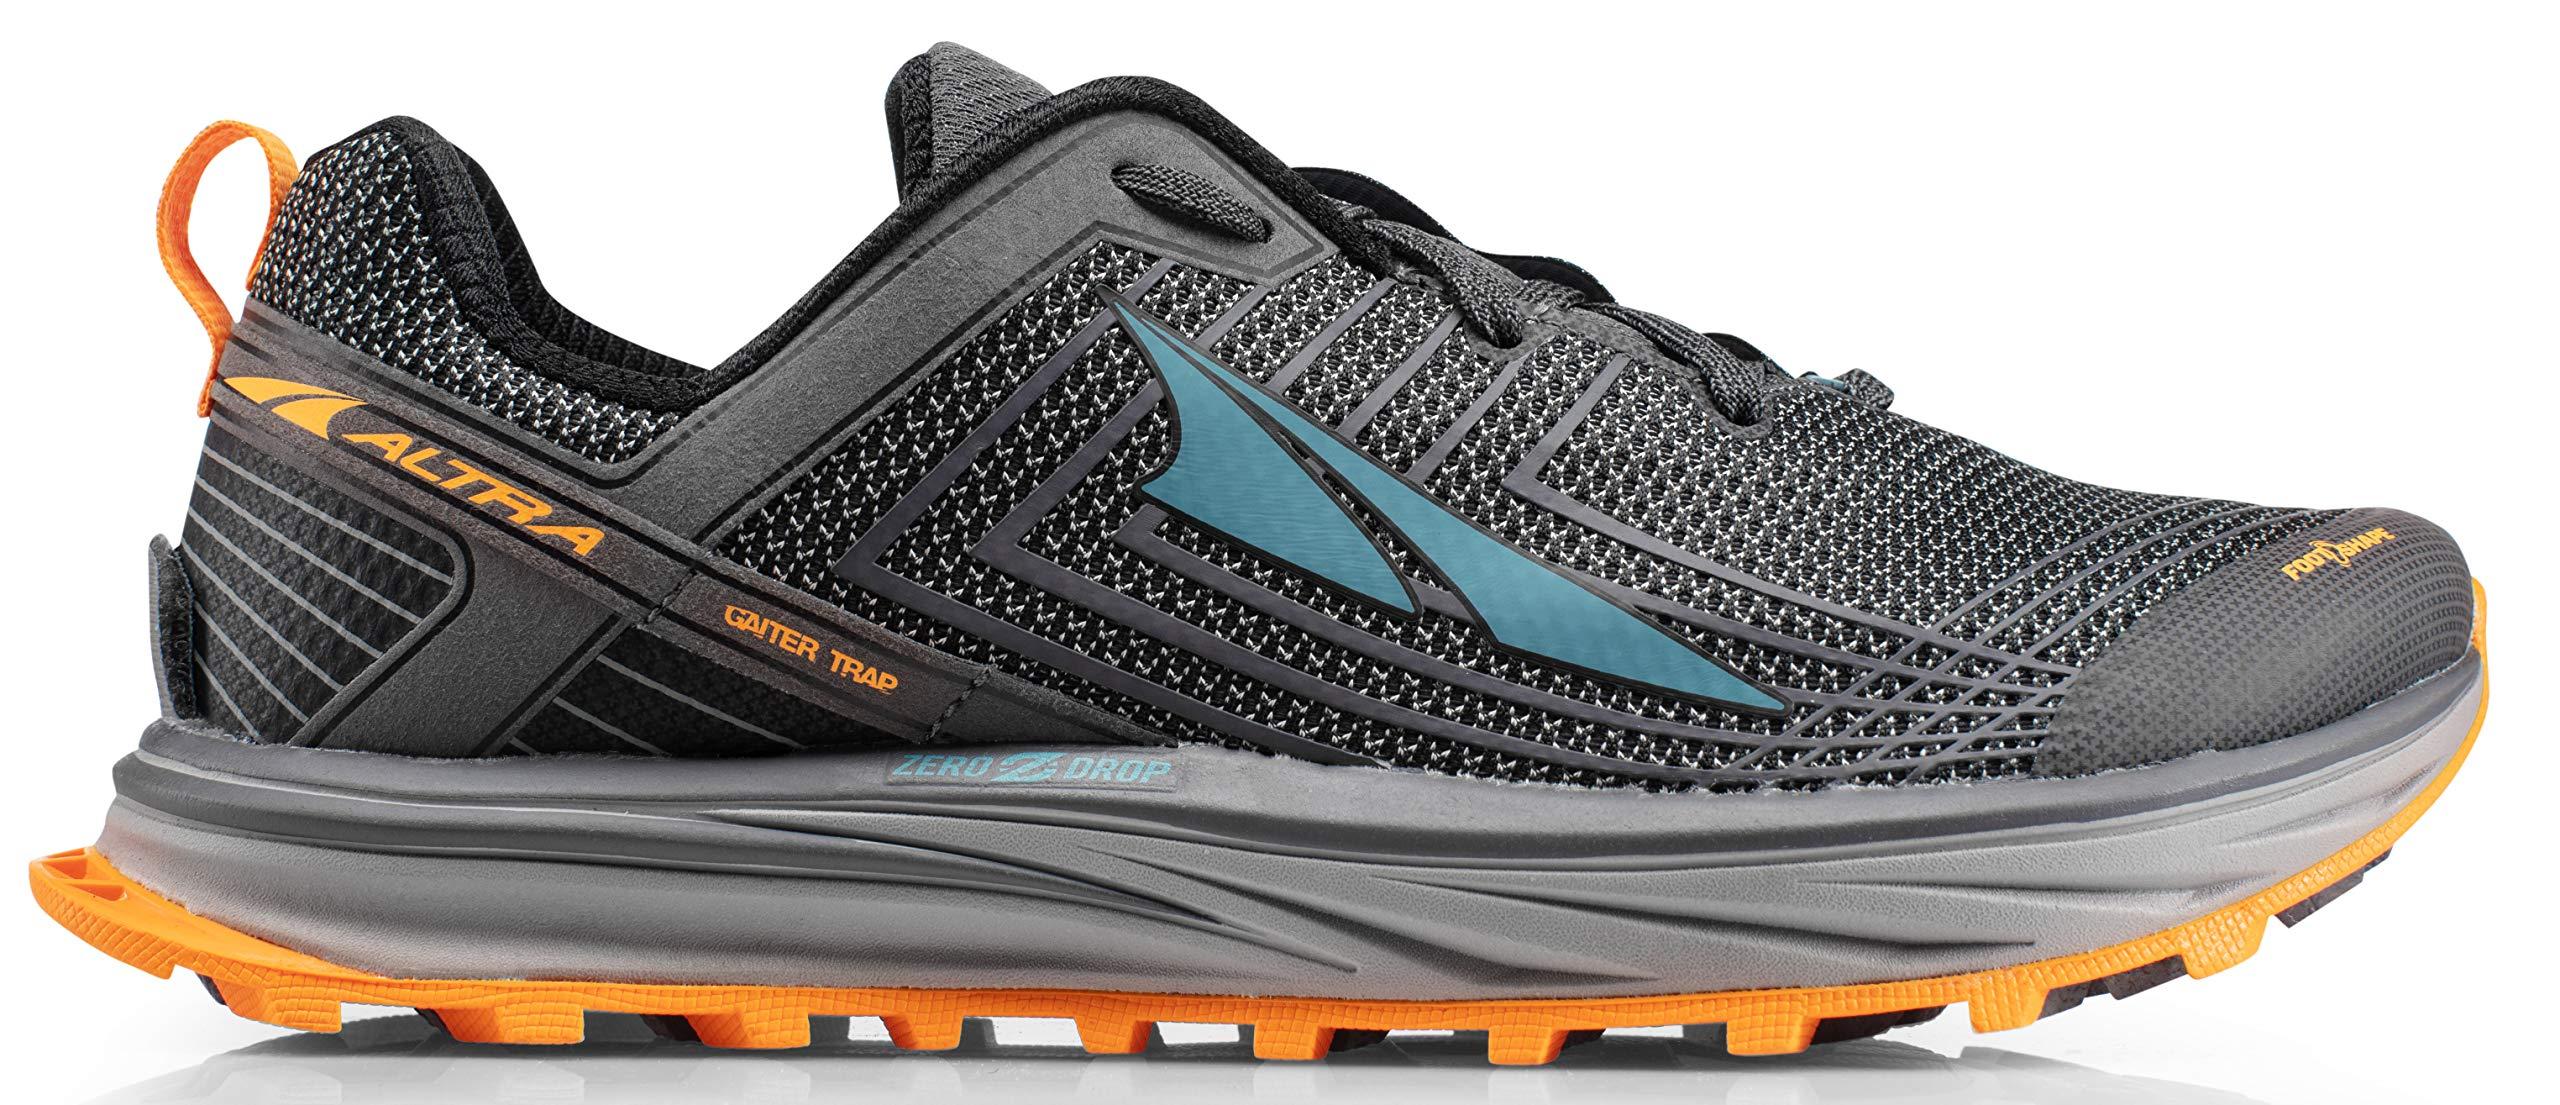 Altra AFM1957F Men's TIMP 1.5 Trail Running Shoe, Gray/Orange - 8.5 D(M) US by Altra (Image #1)